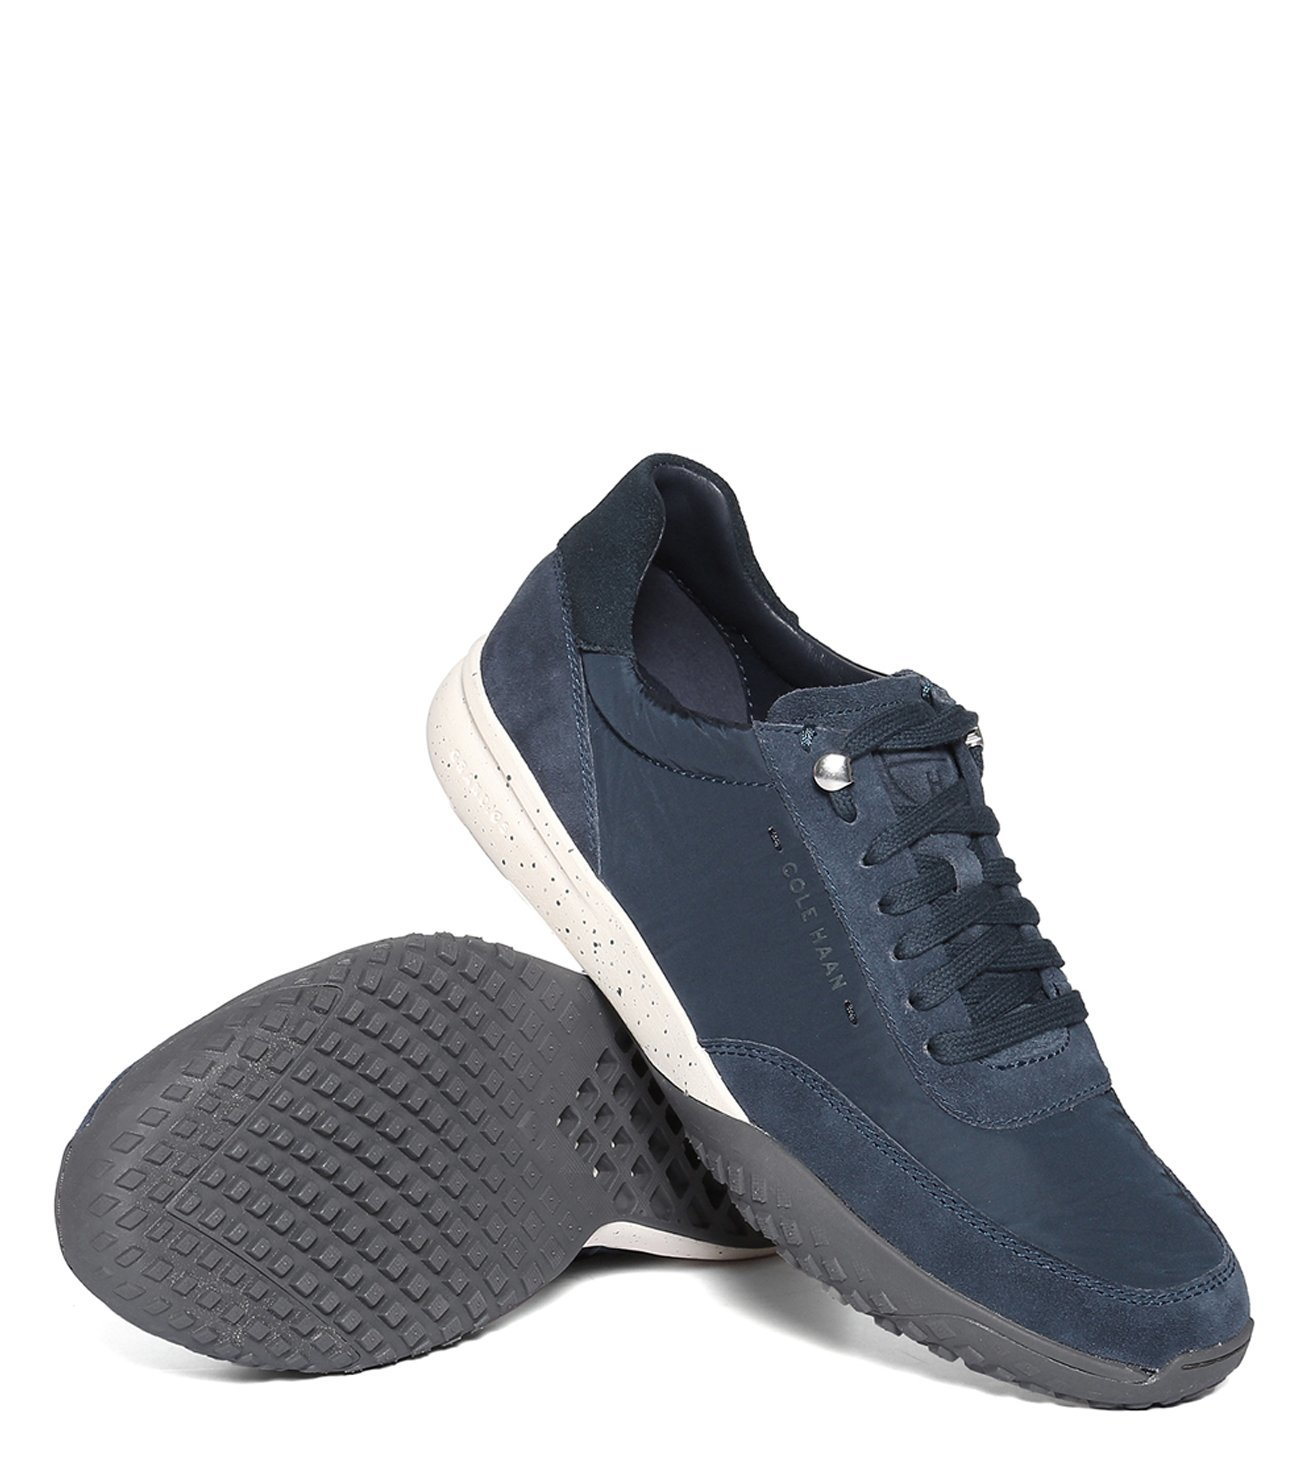 Cole Haan Navy Grandpro Trail Sneakers